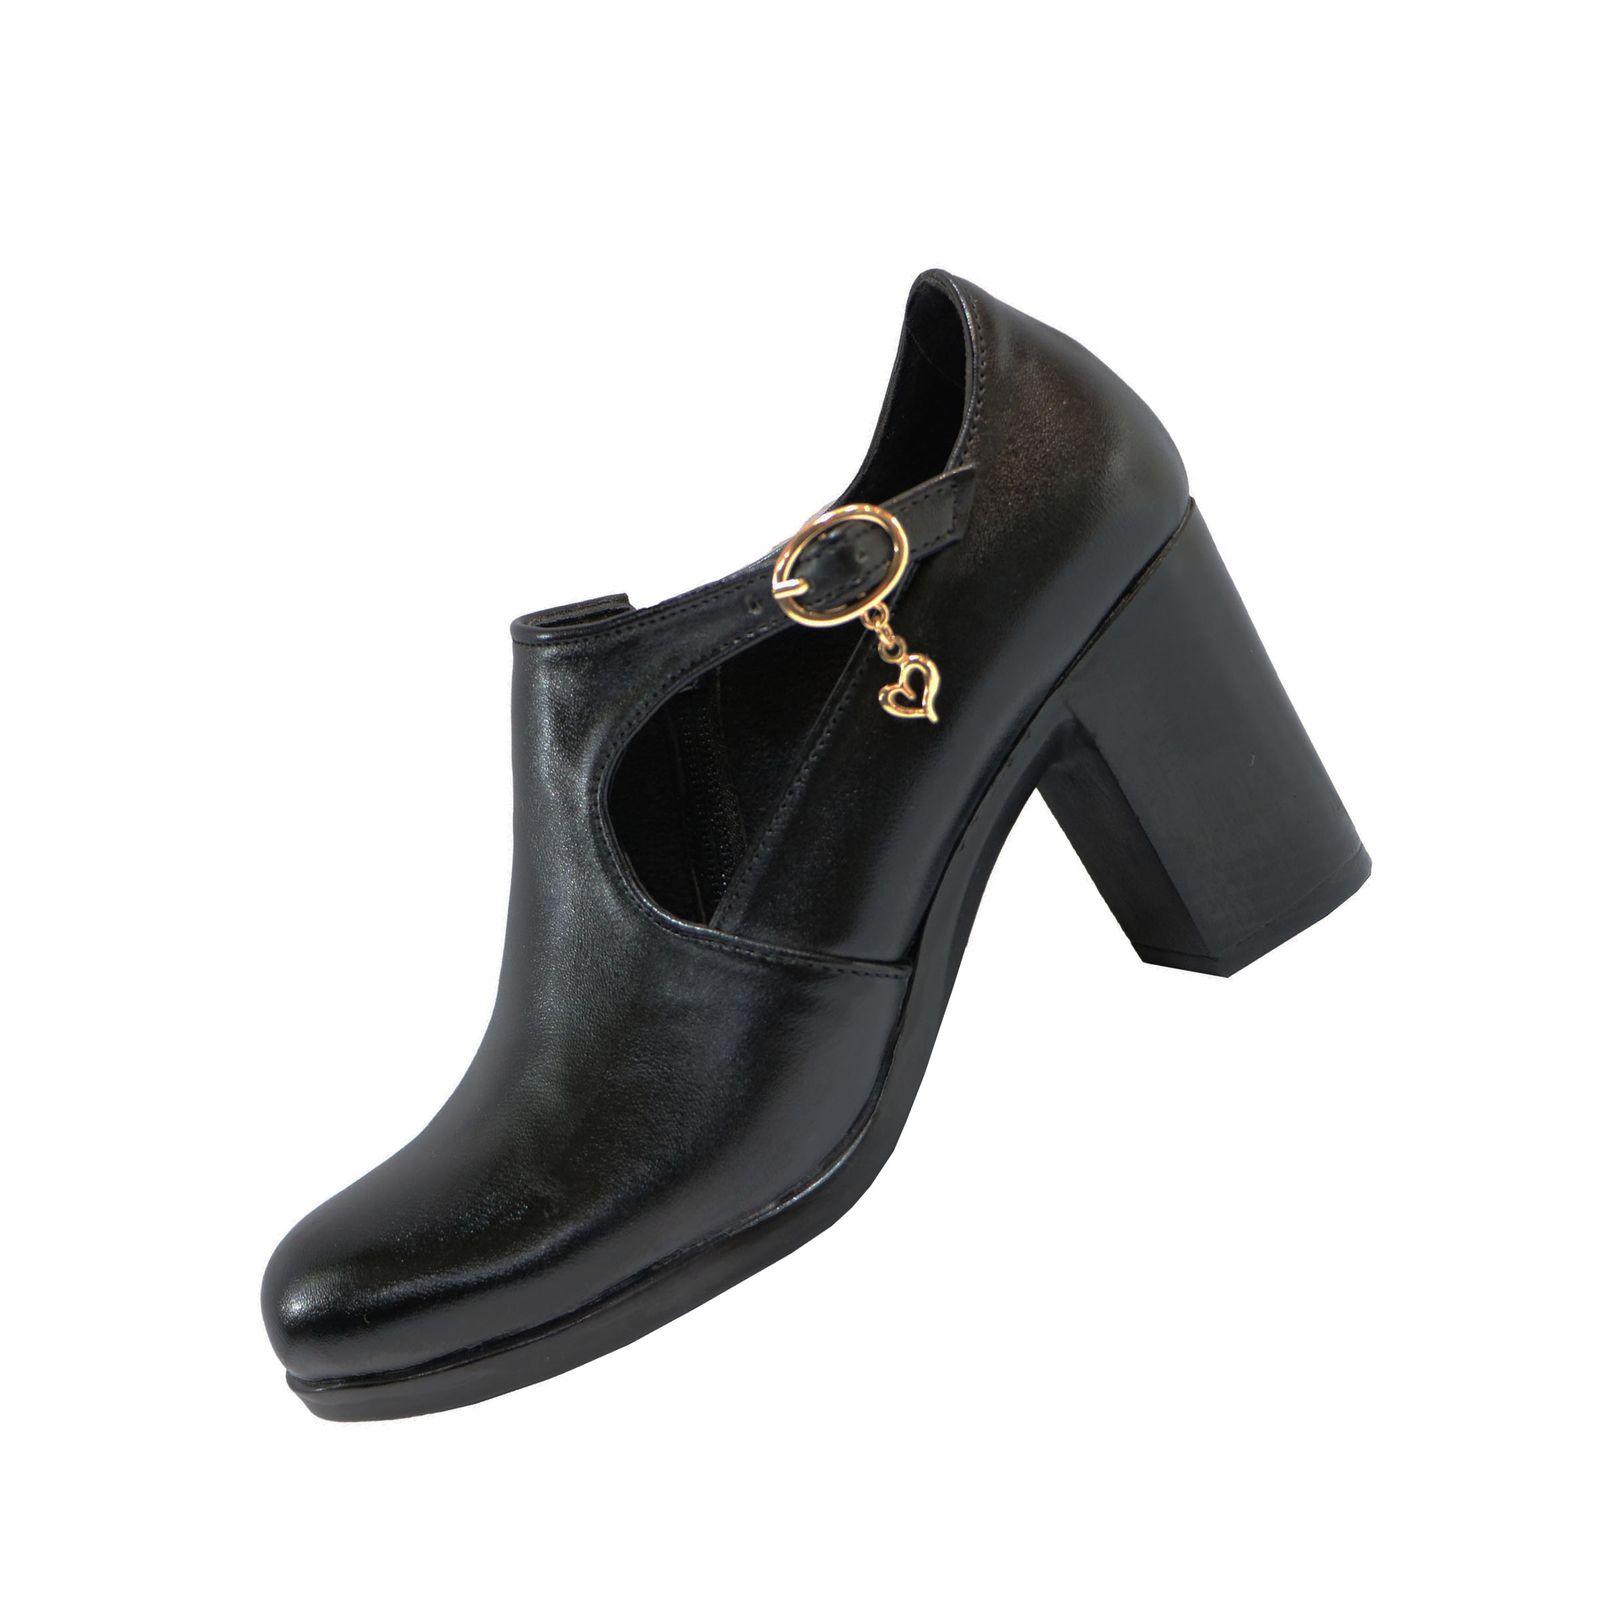 کفش زنانه کد 98223 -  - 4